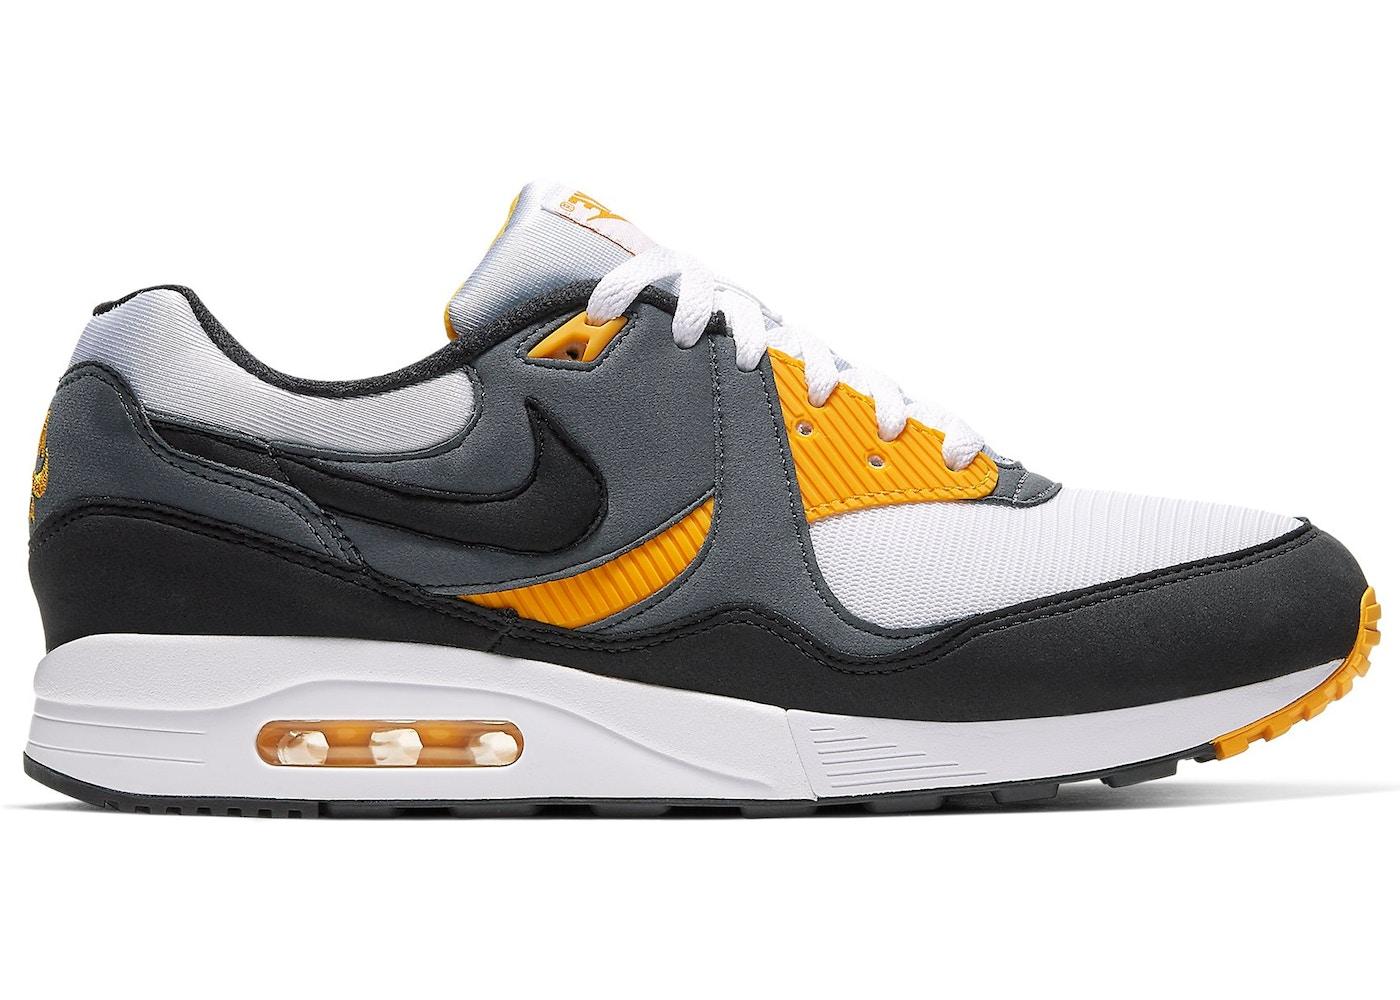 Nike Air Max Light University Gold - AO8285-102